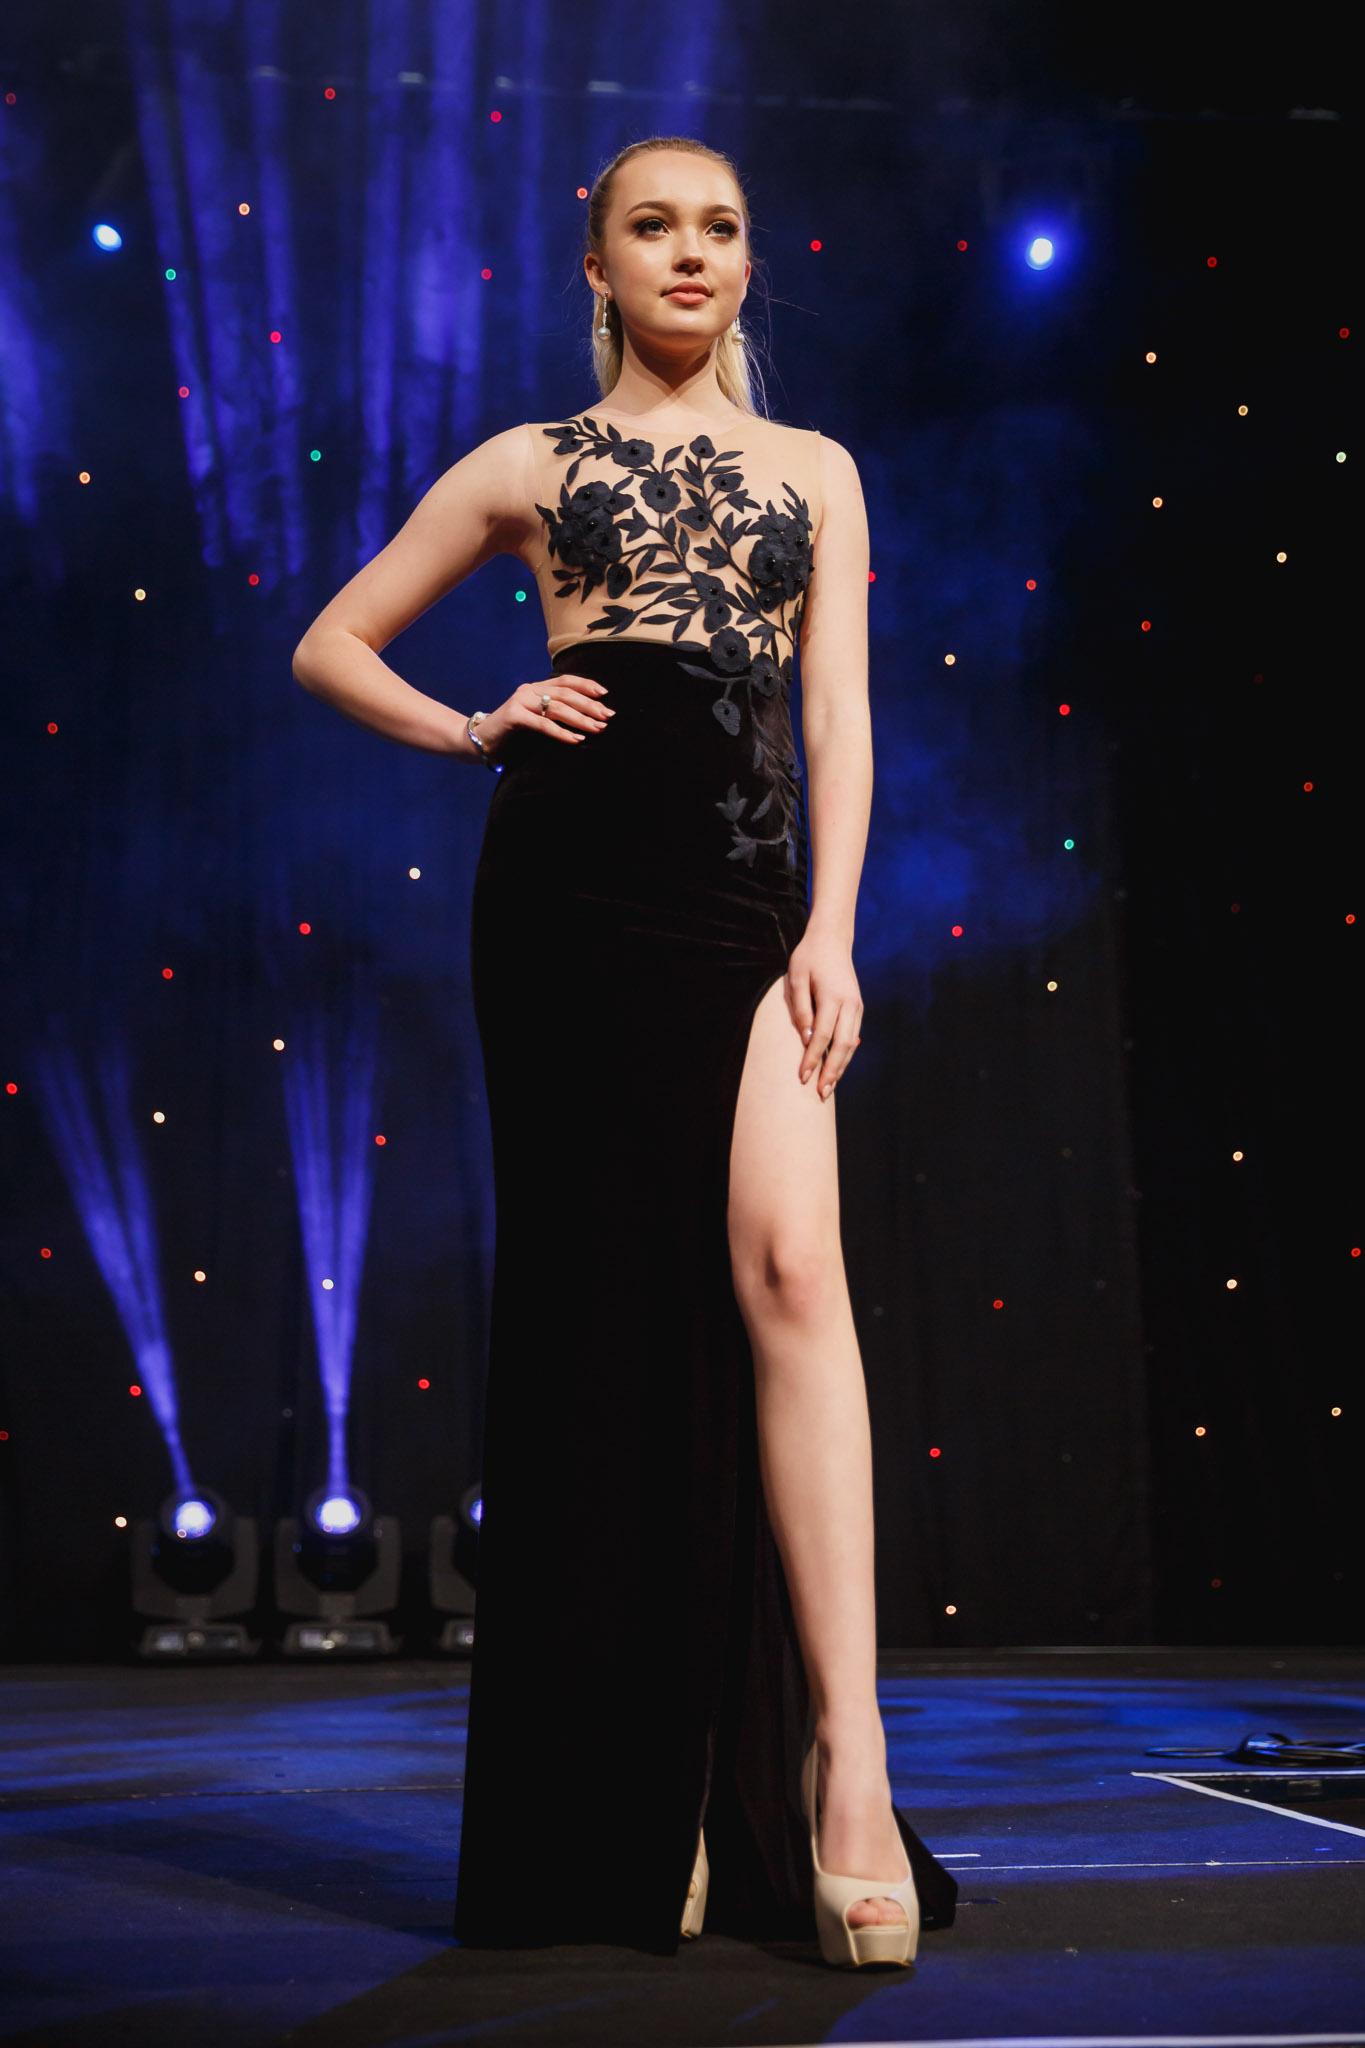 Fashion Stylist Kirsty Milligan